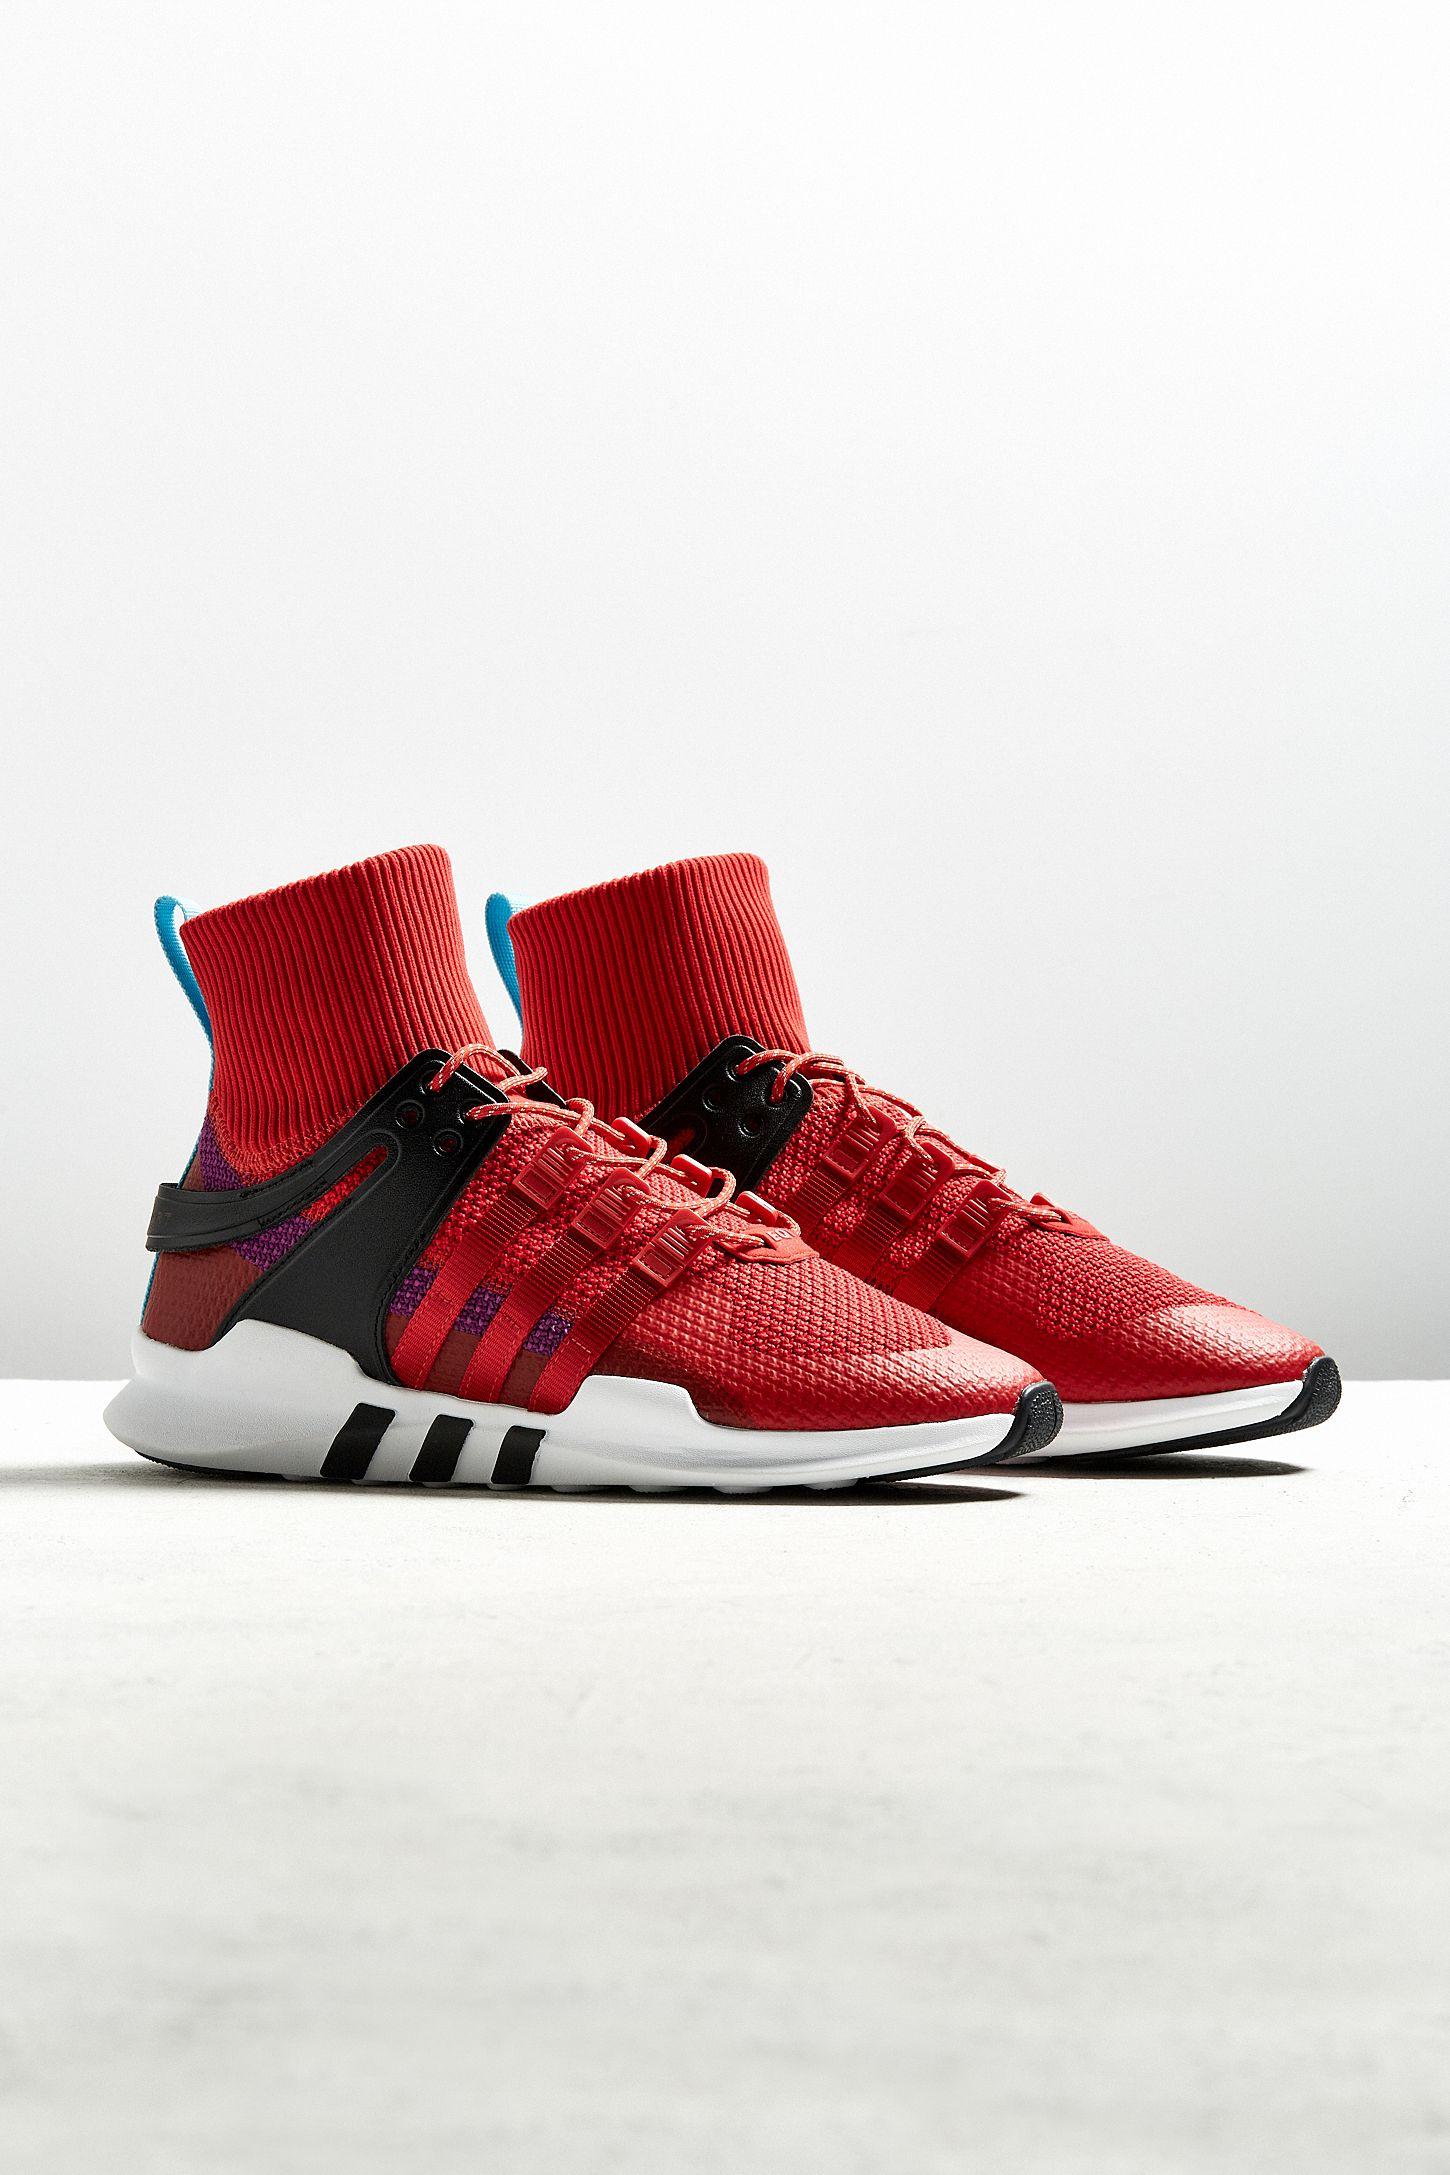 76a1b54a3 adidas EQT Support ADV Winter Sneaker